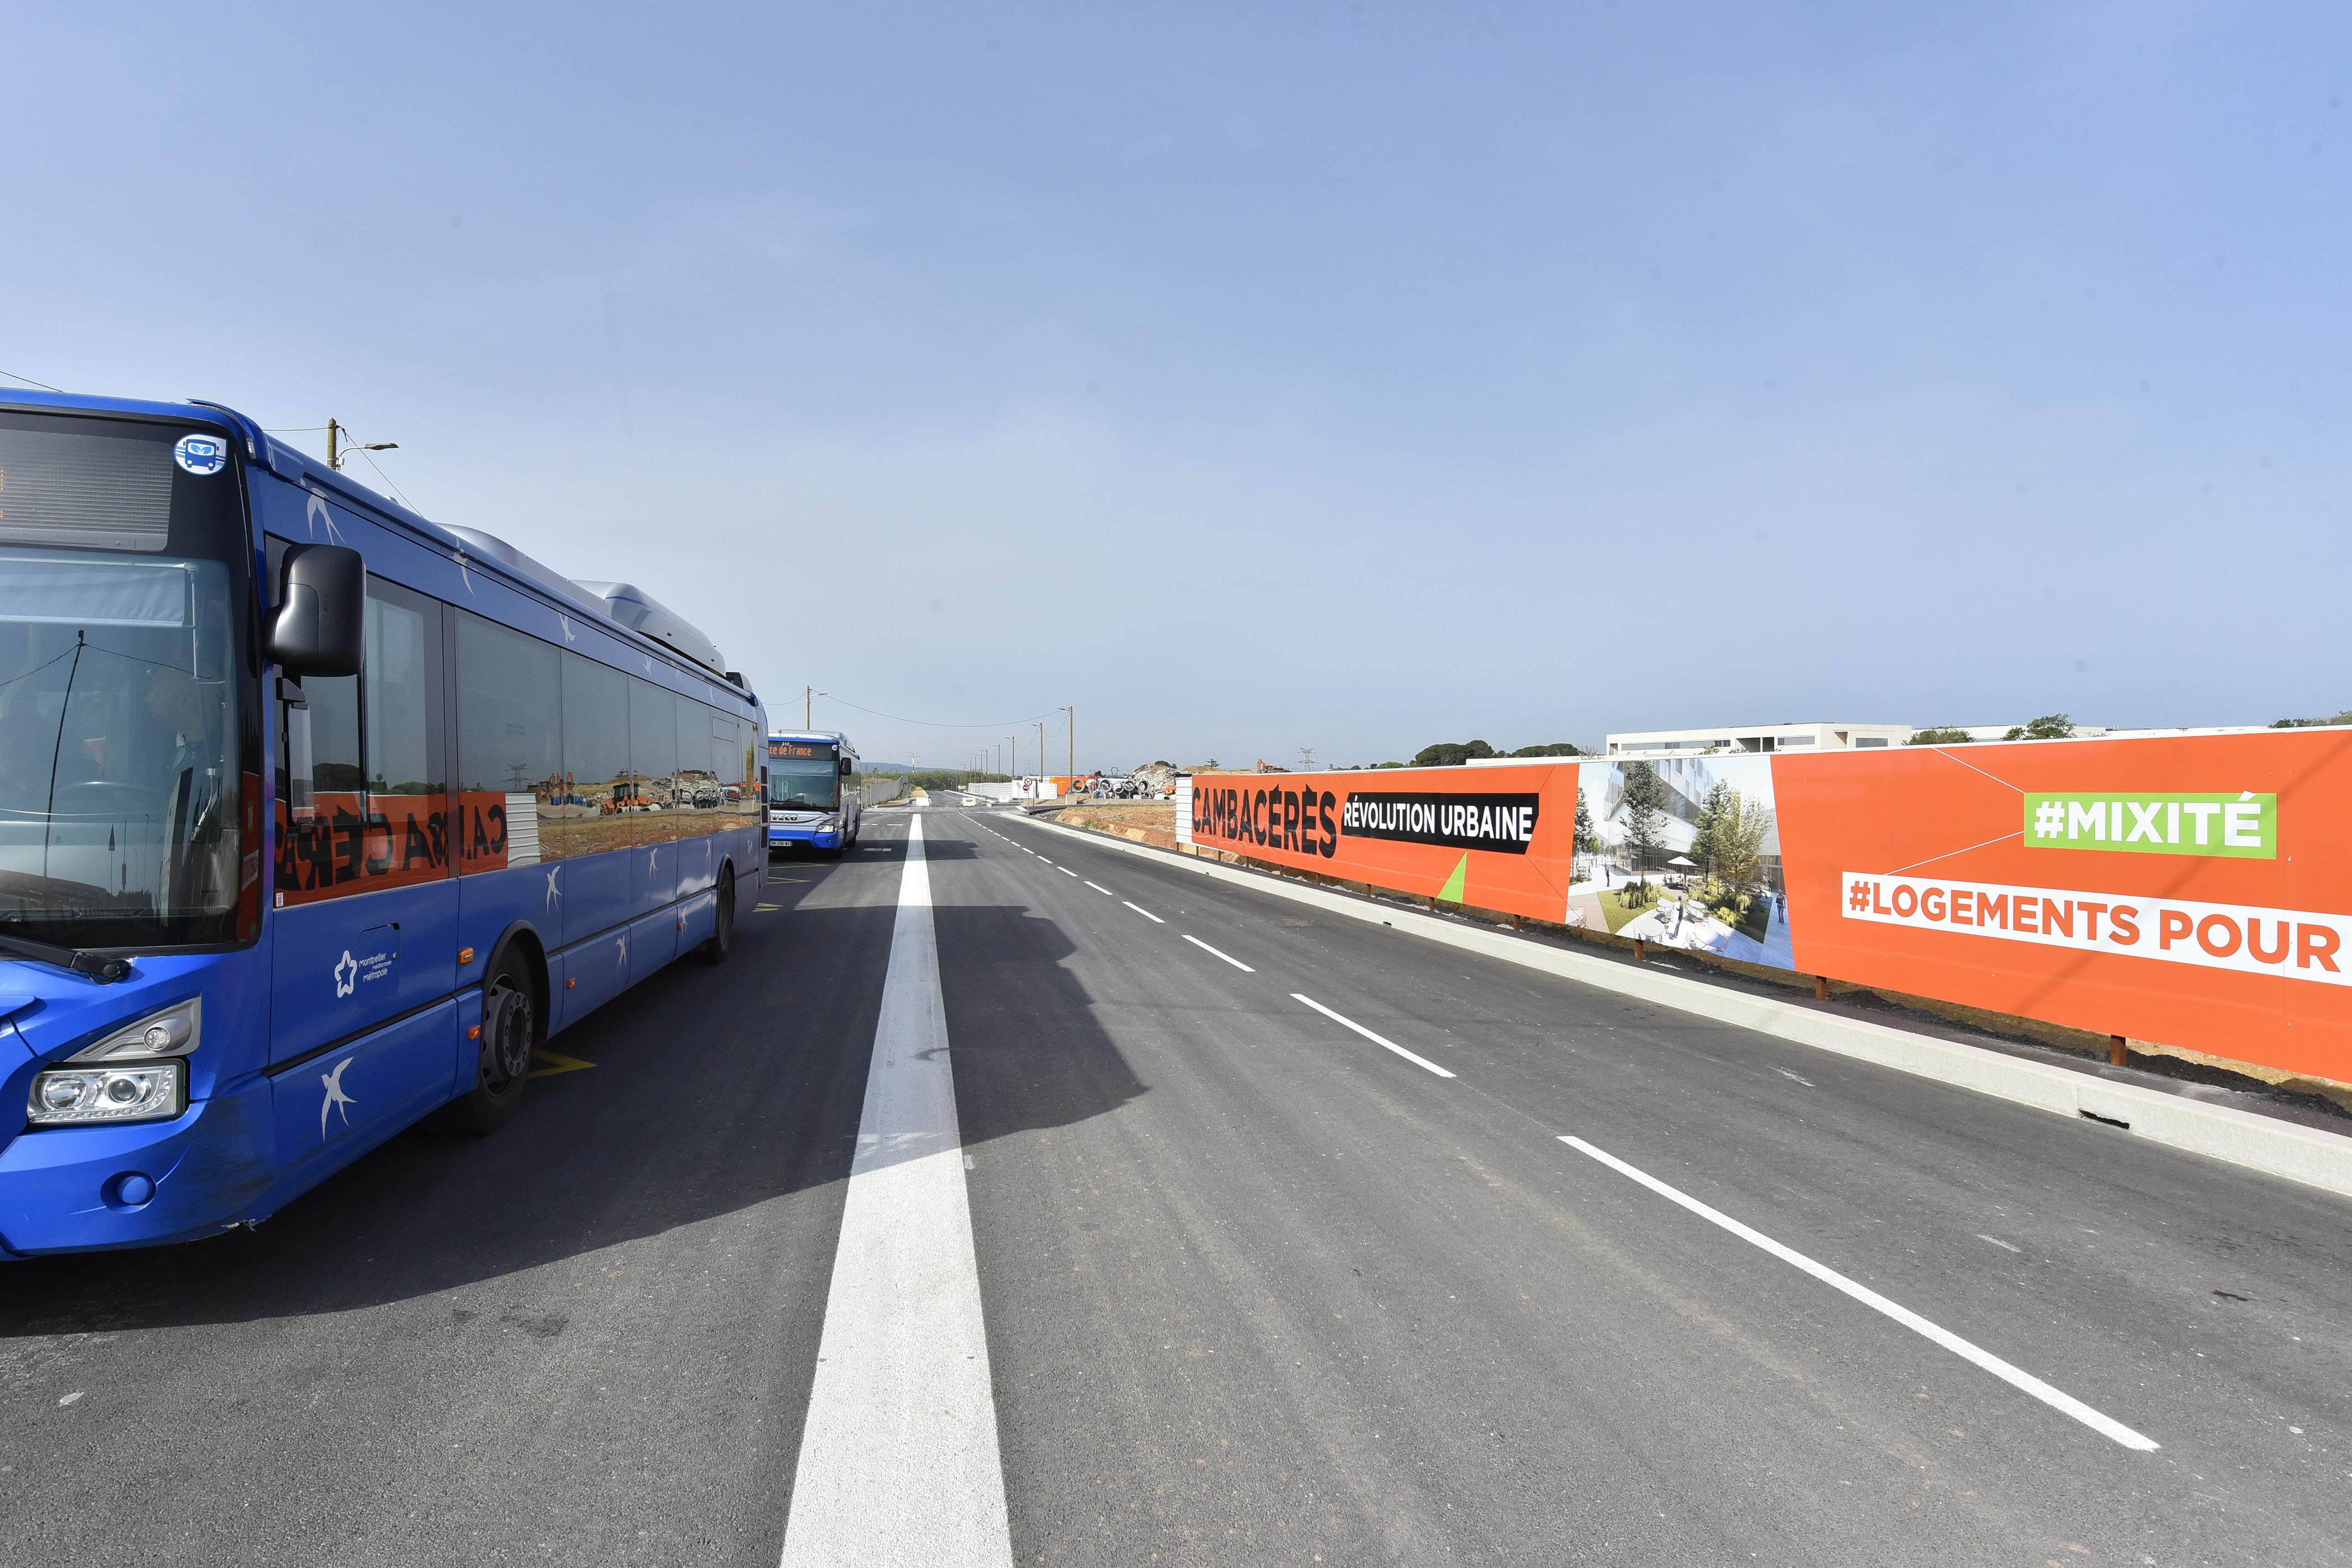 moyens et infrastructures supplémentaires